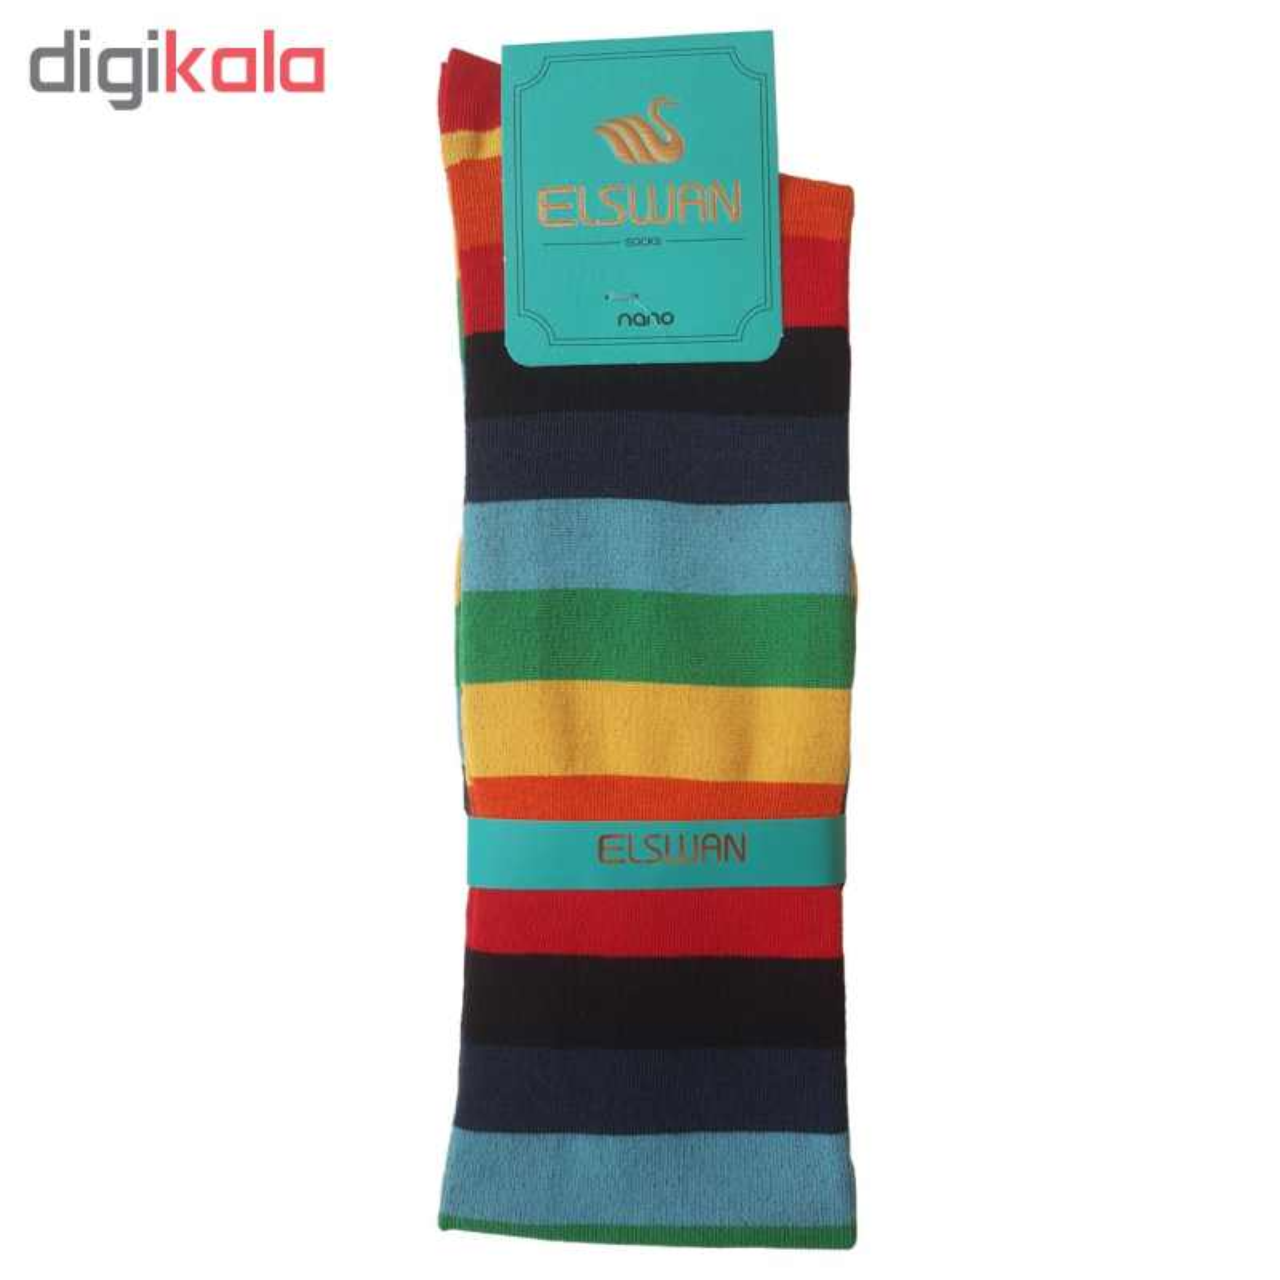 جوراب بلند زنانه ال سون طرح رنگین کمان کد PH75